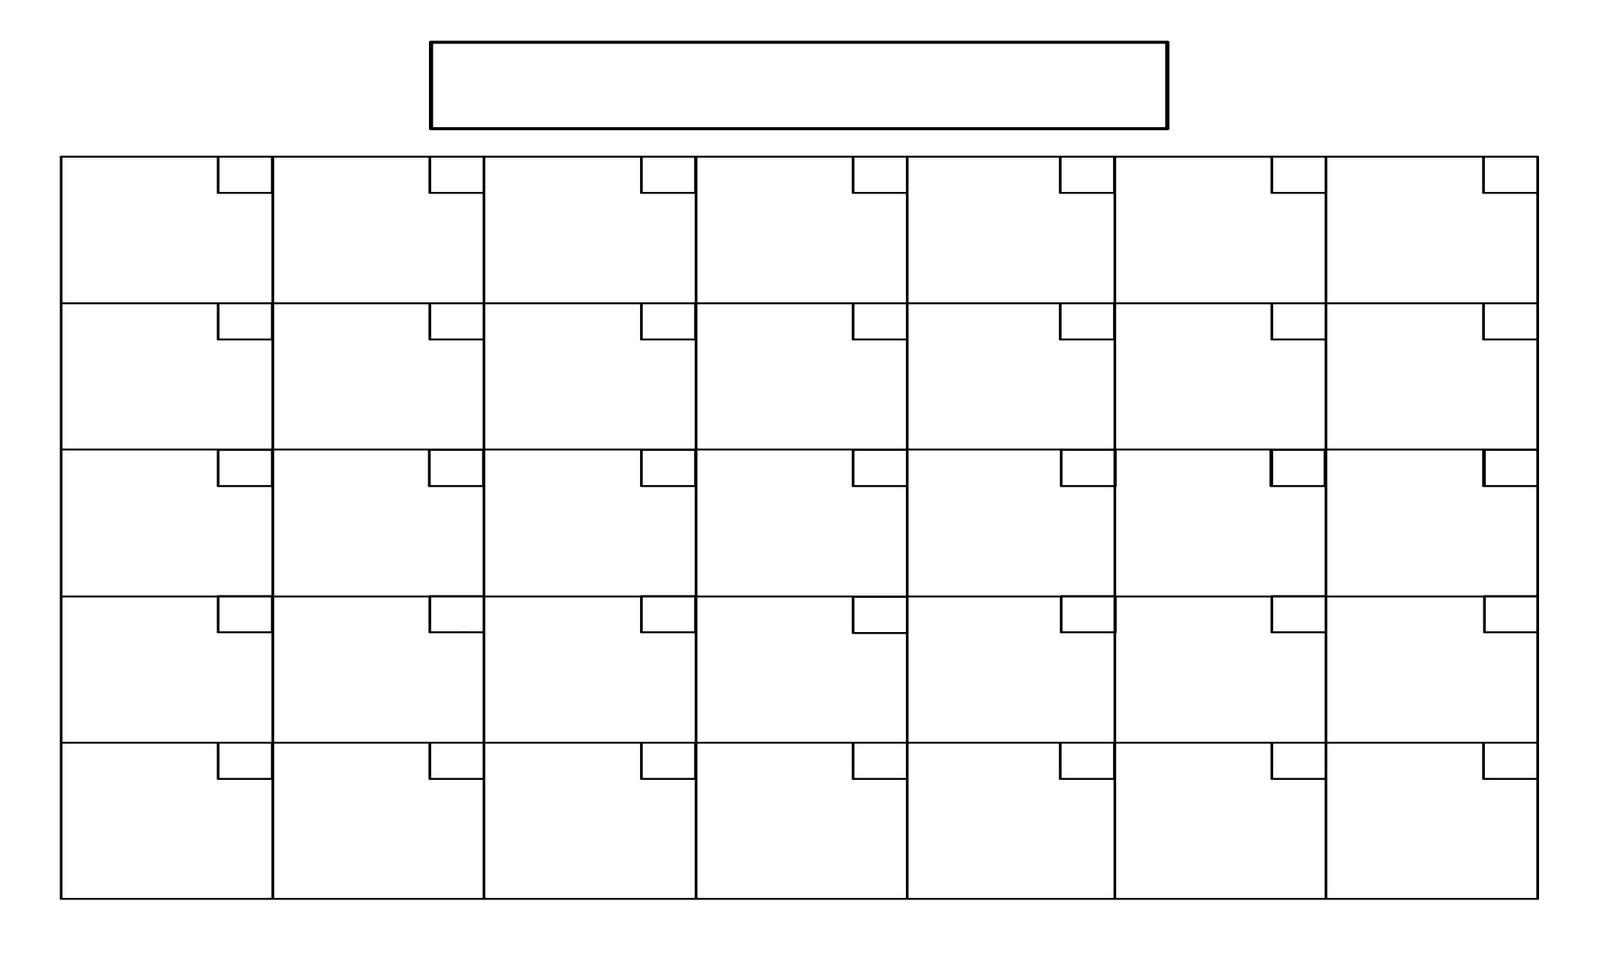 16 Simple Blank Calendar Template Images - Full Size Blank-Free Printable Blank Calendar Grid